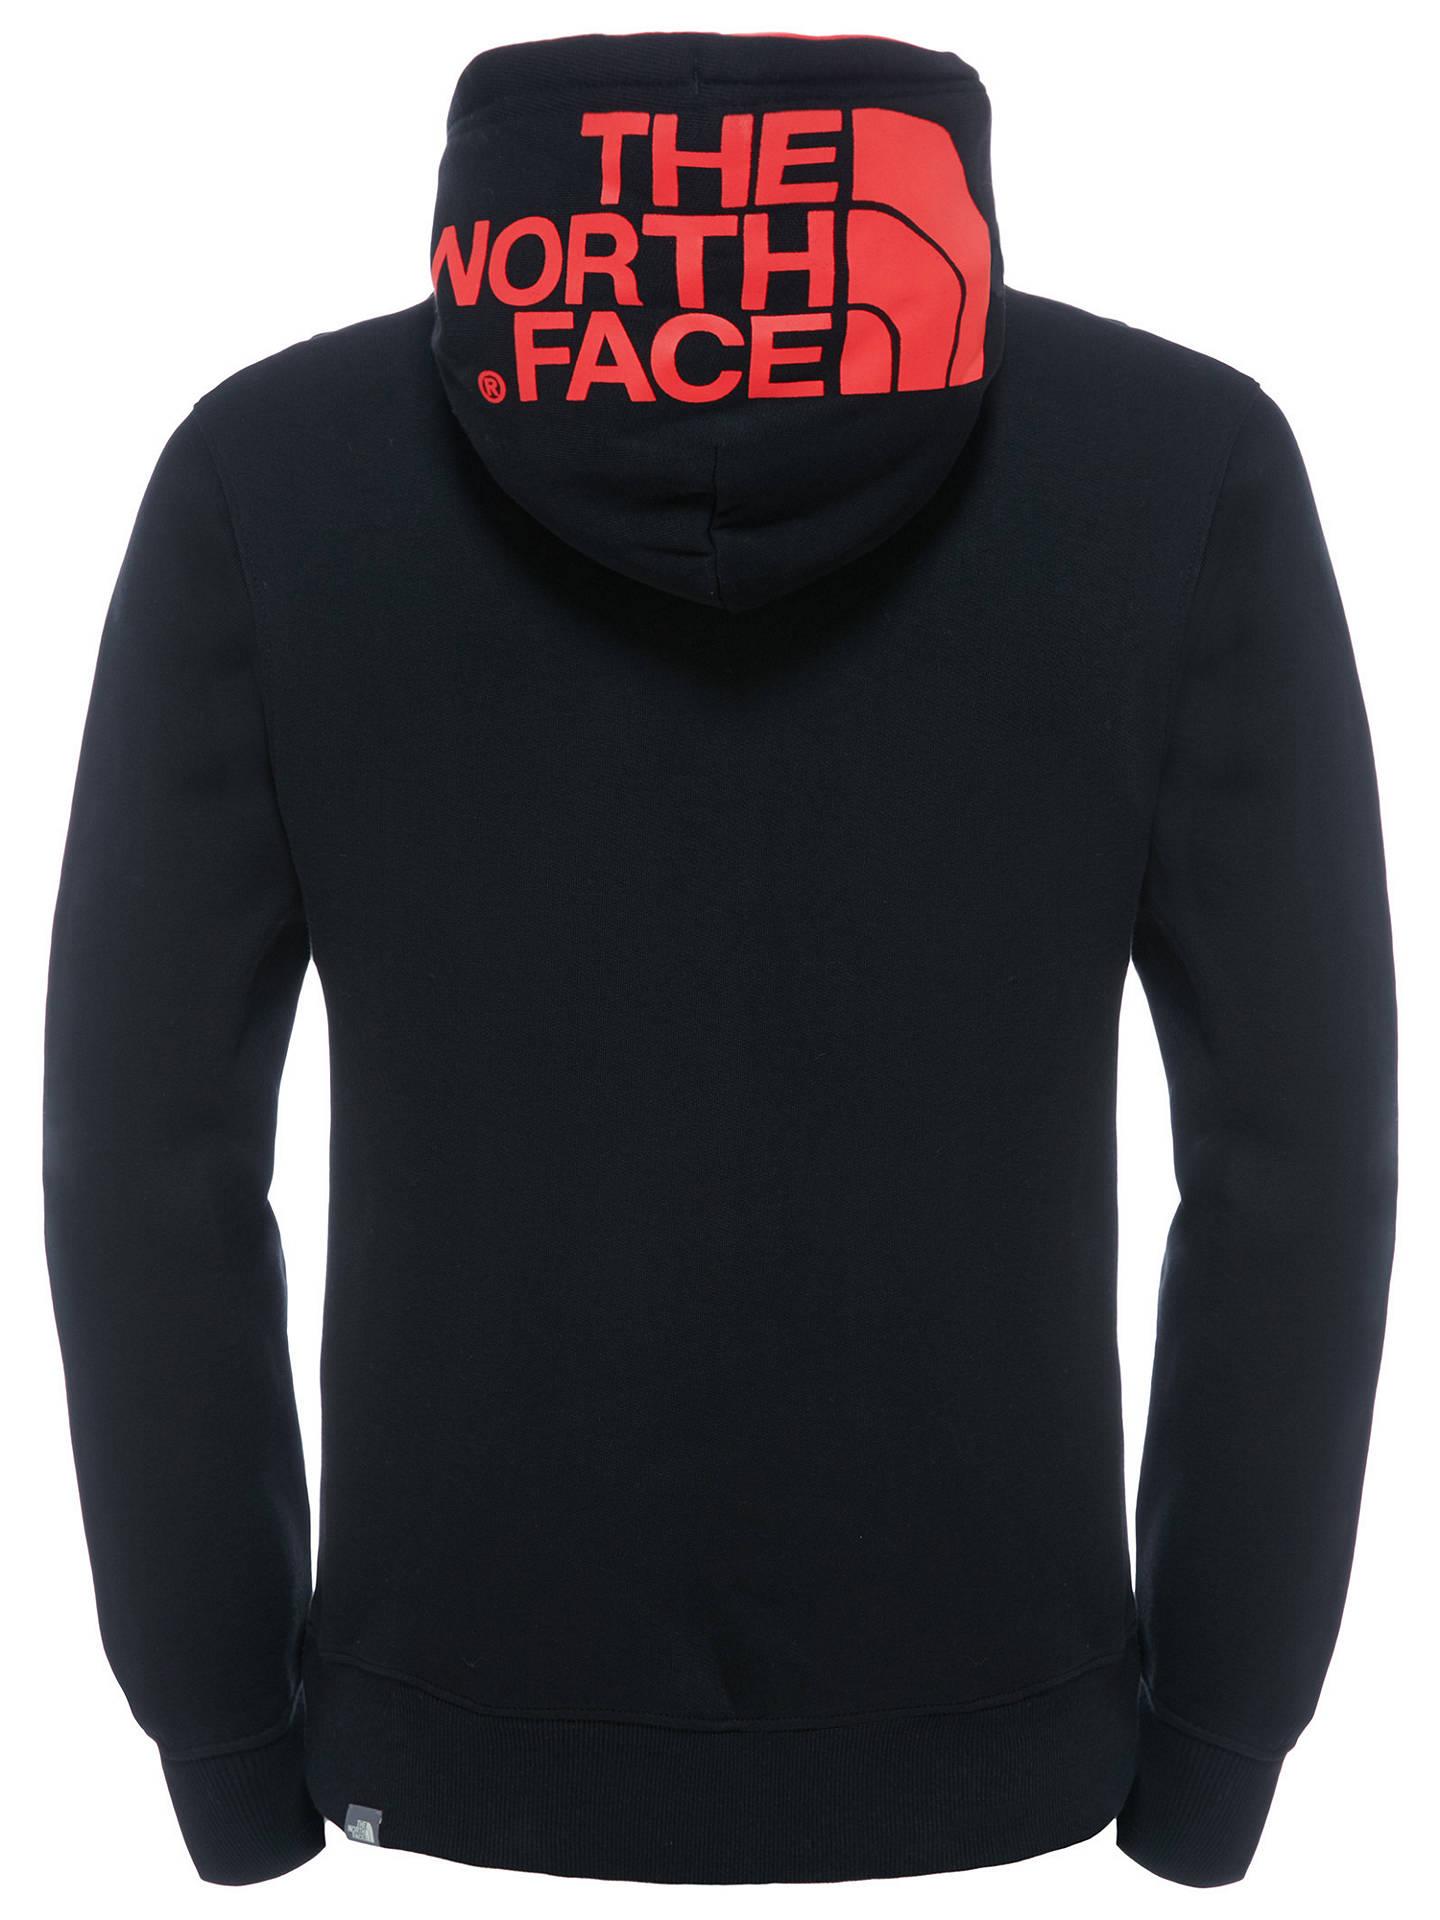 4897fa6b4 The North Face Drew Peak Hoodie, Black/Red at John Lewis & Partners